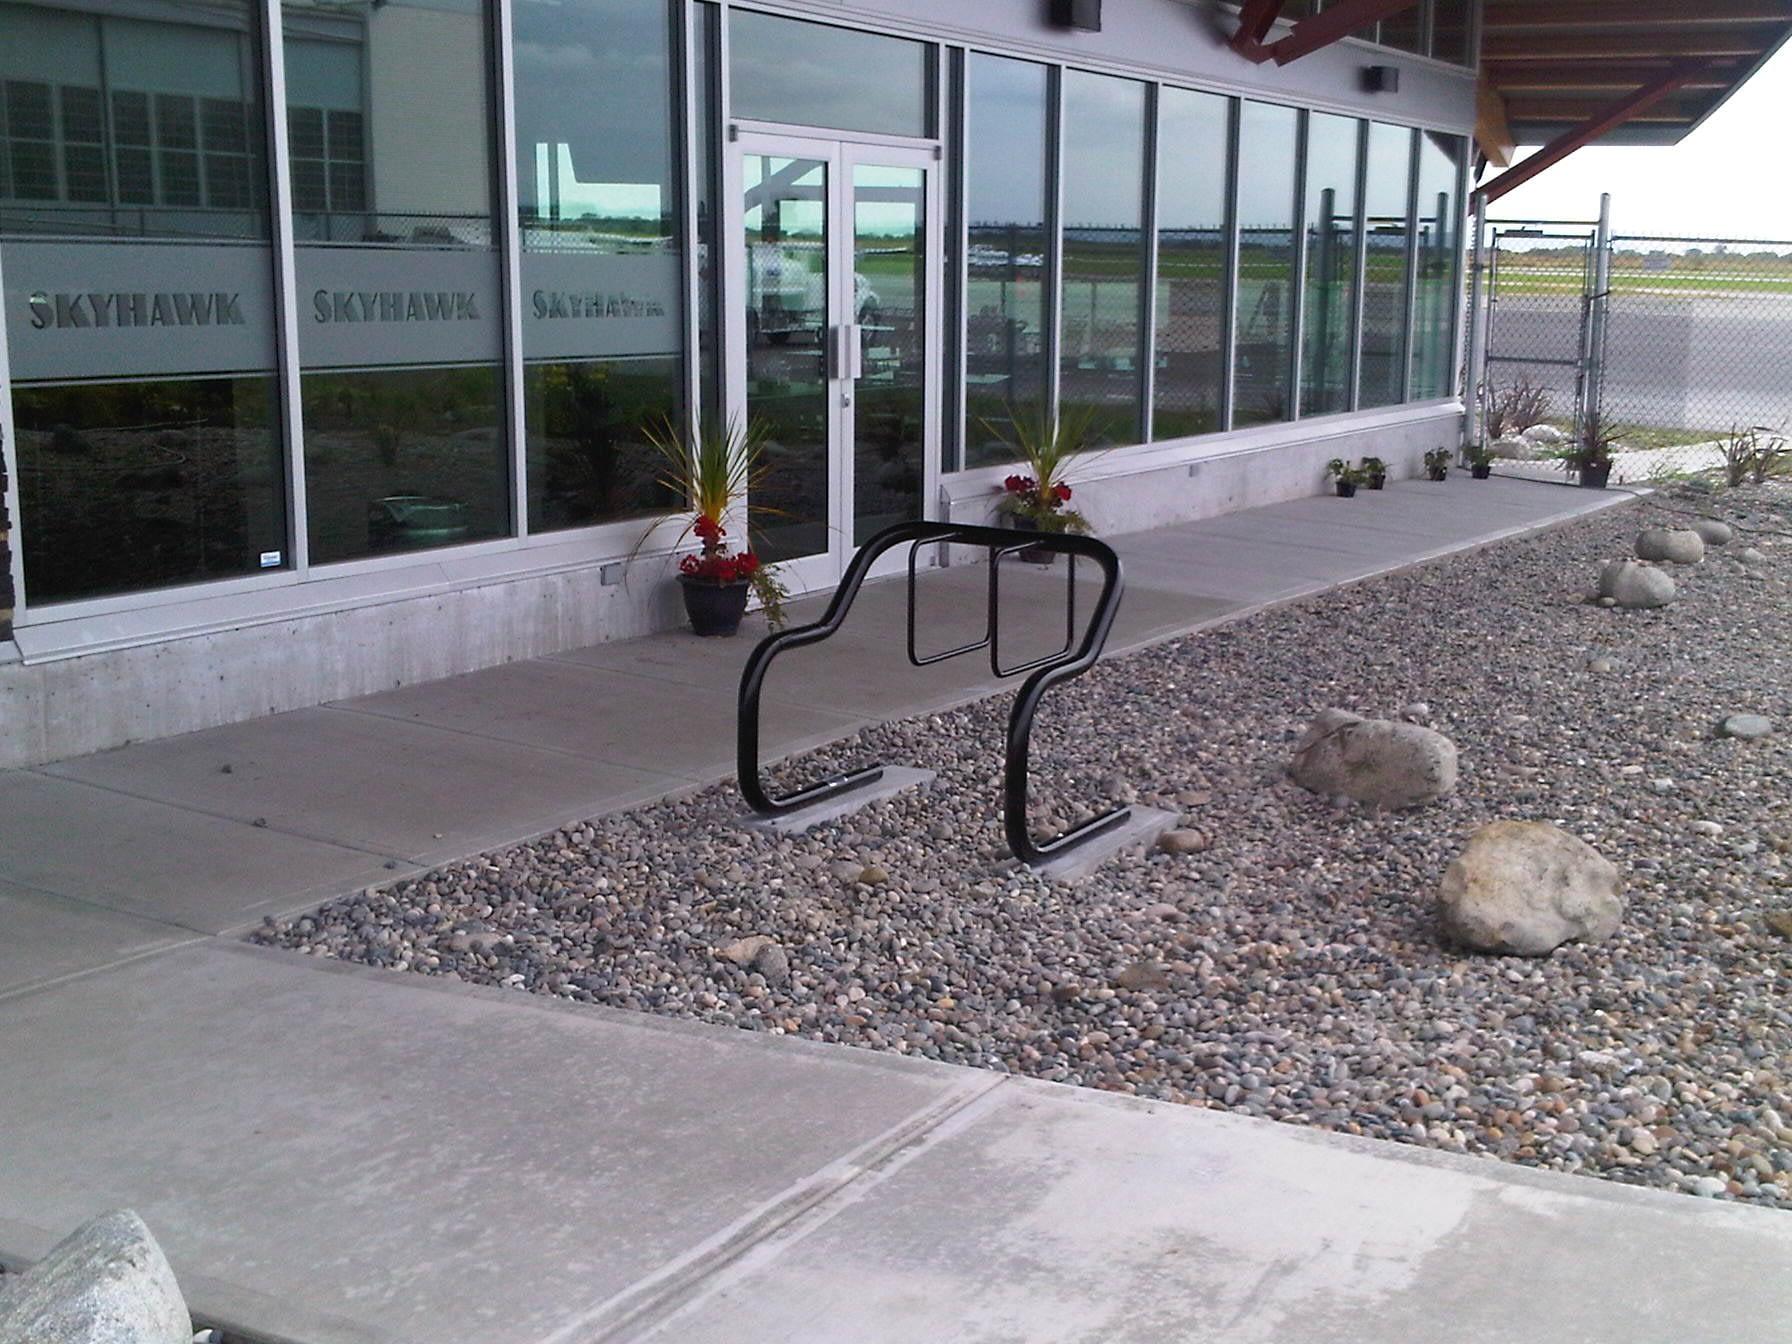 Boundary Bay Airport